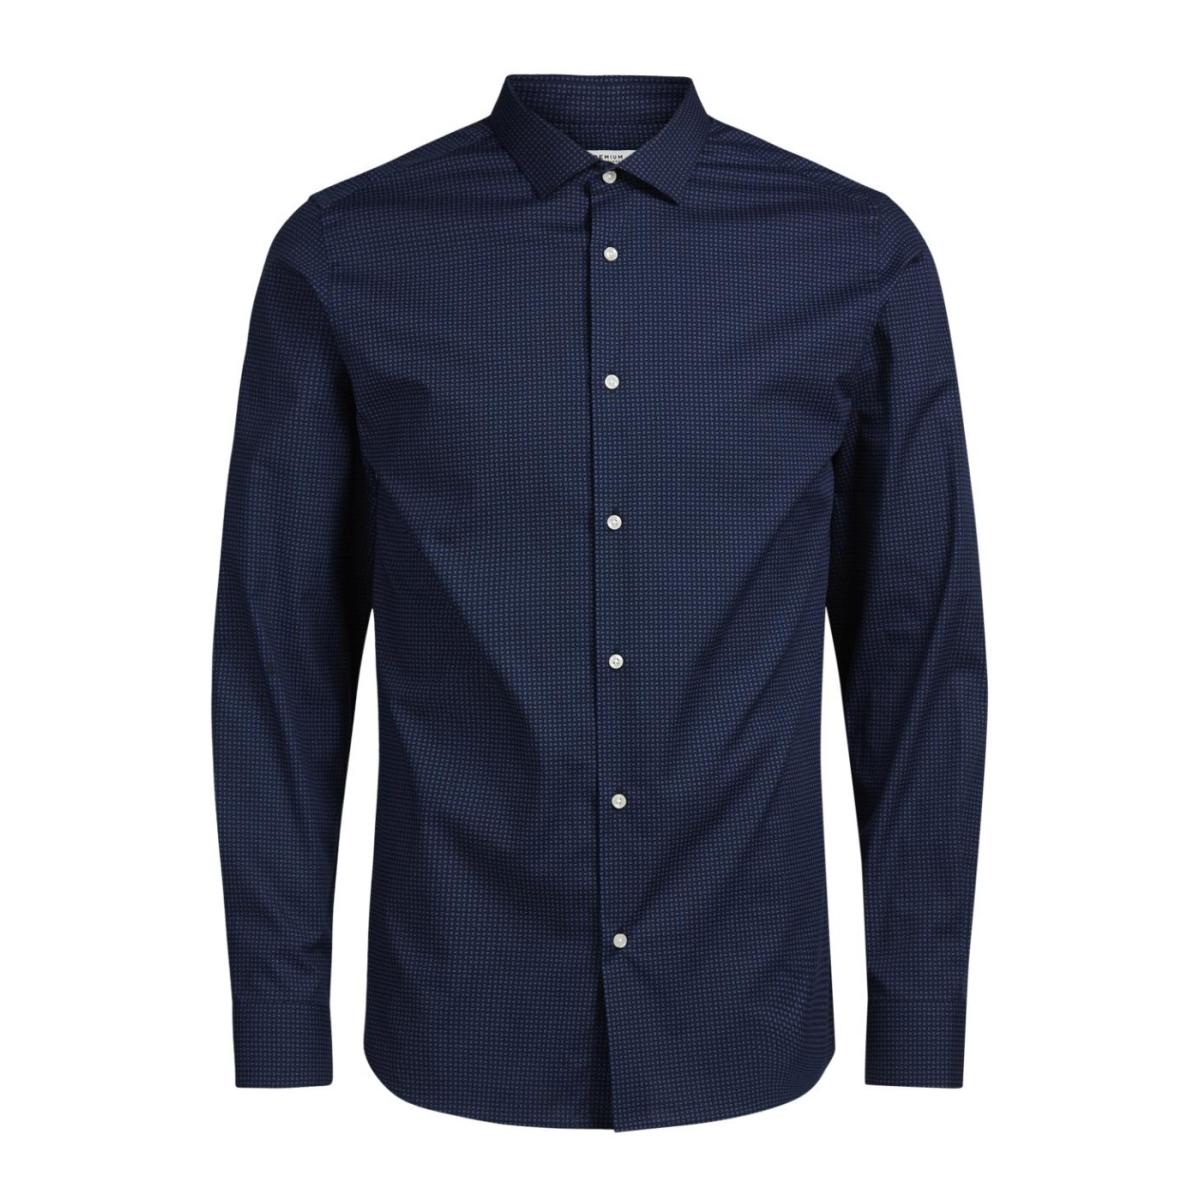 jprjose shirt l/s plain 12122830 jack & jones overhemd navy blazer